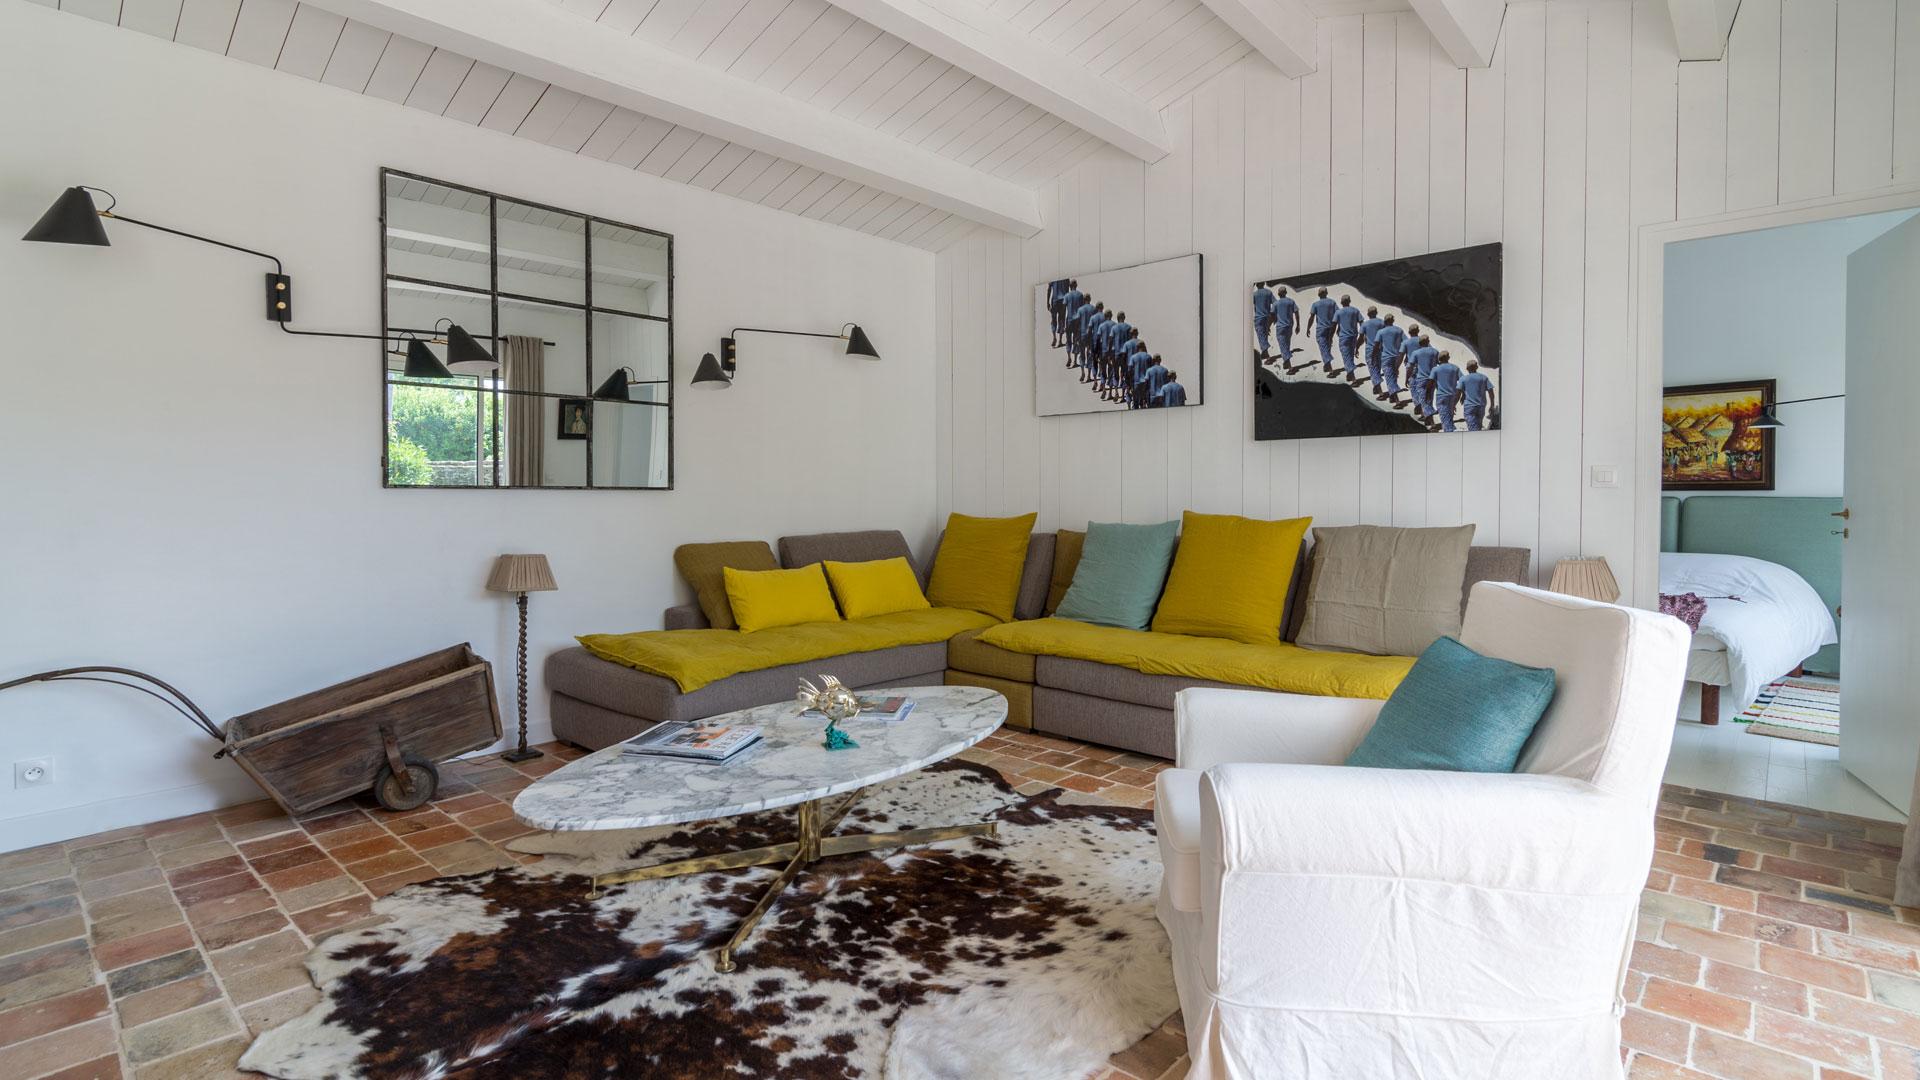 Photos de la villa shems en r le de r villanovo for Villa ile de re